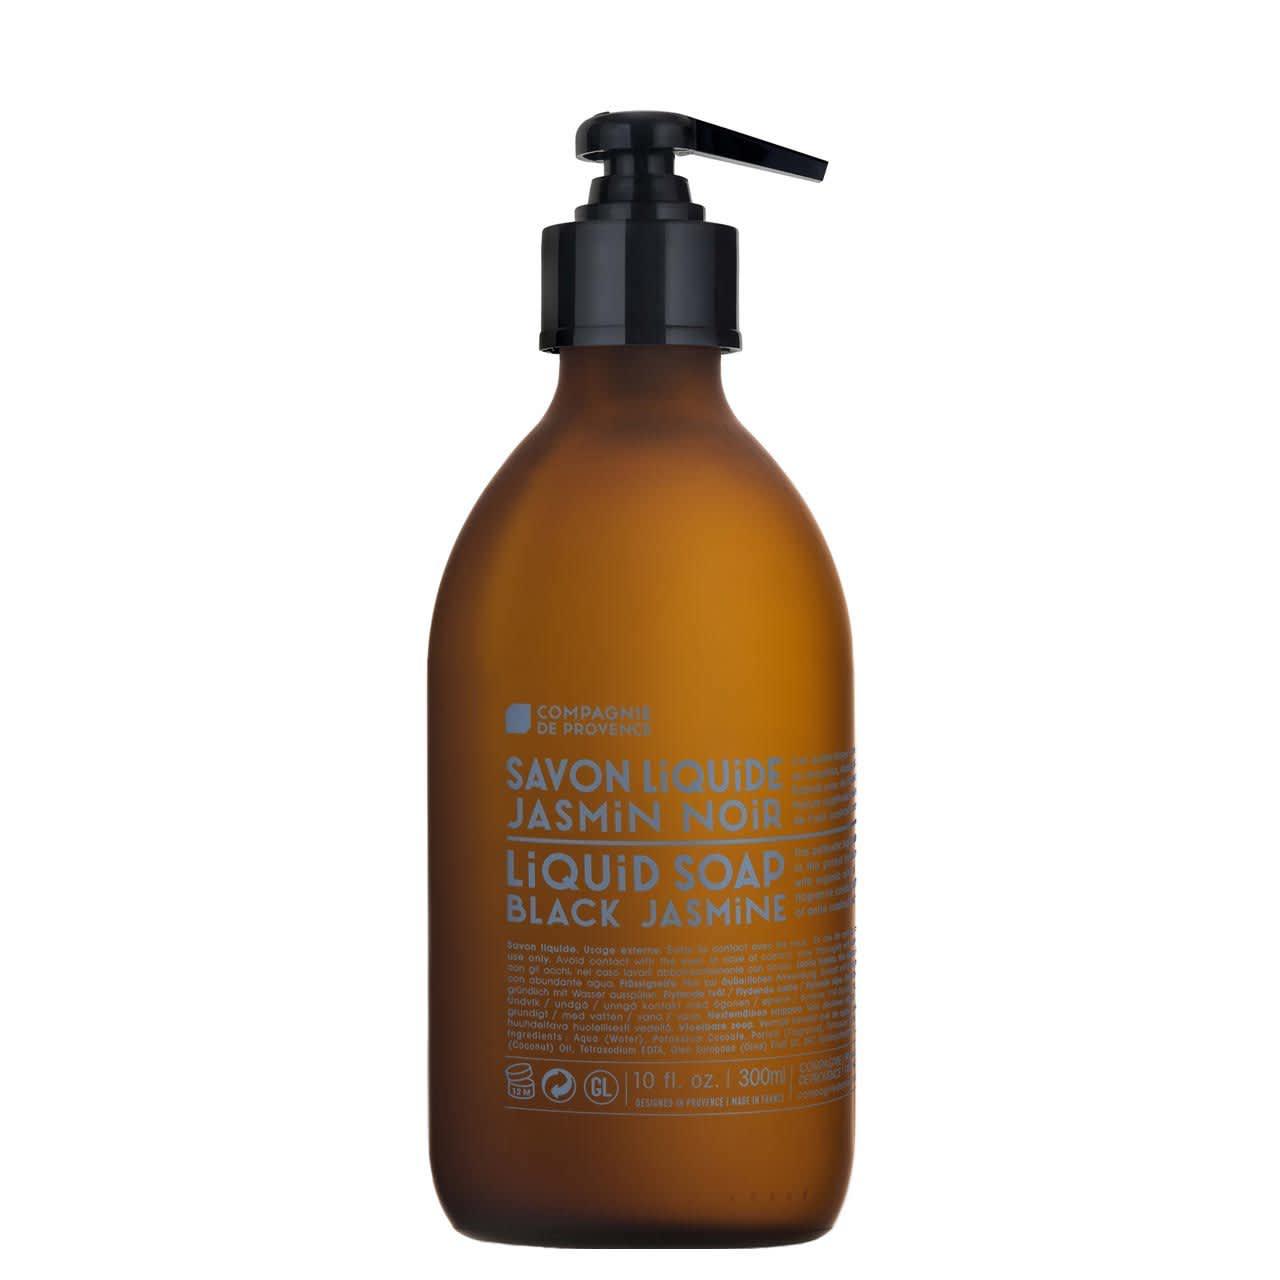 Compagnie De Provence Black Jasmine Liquid Soap